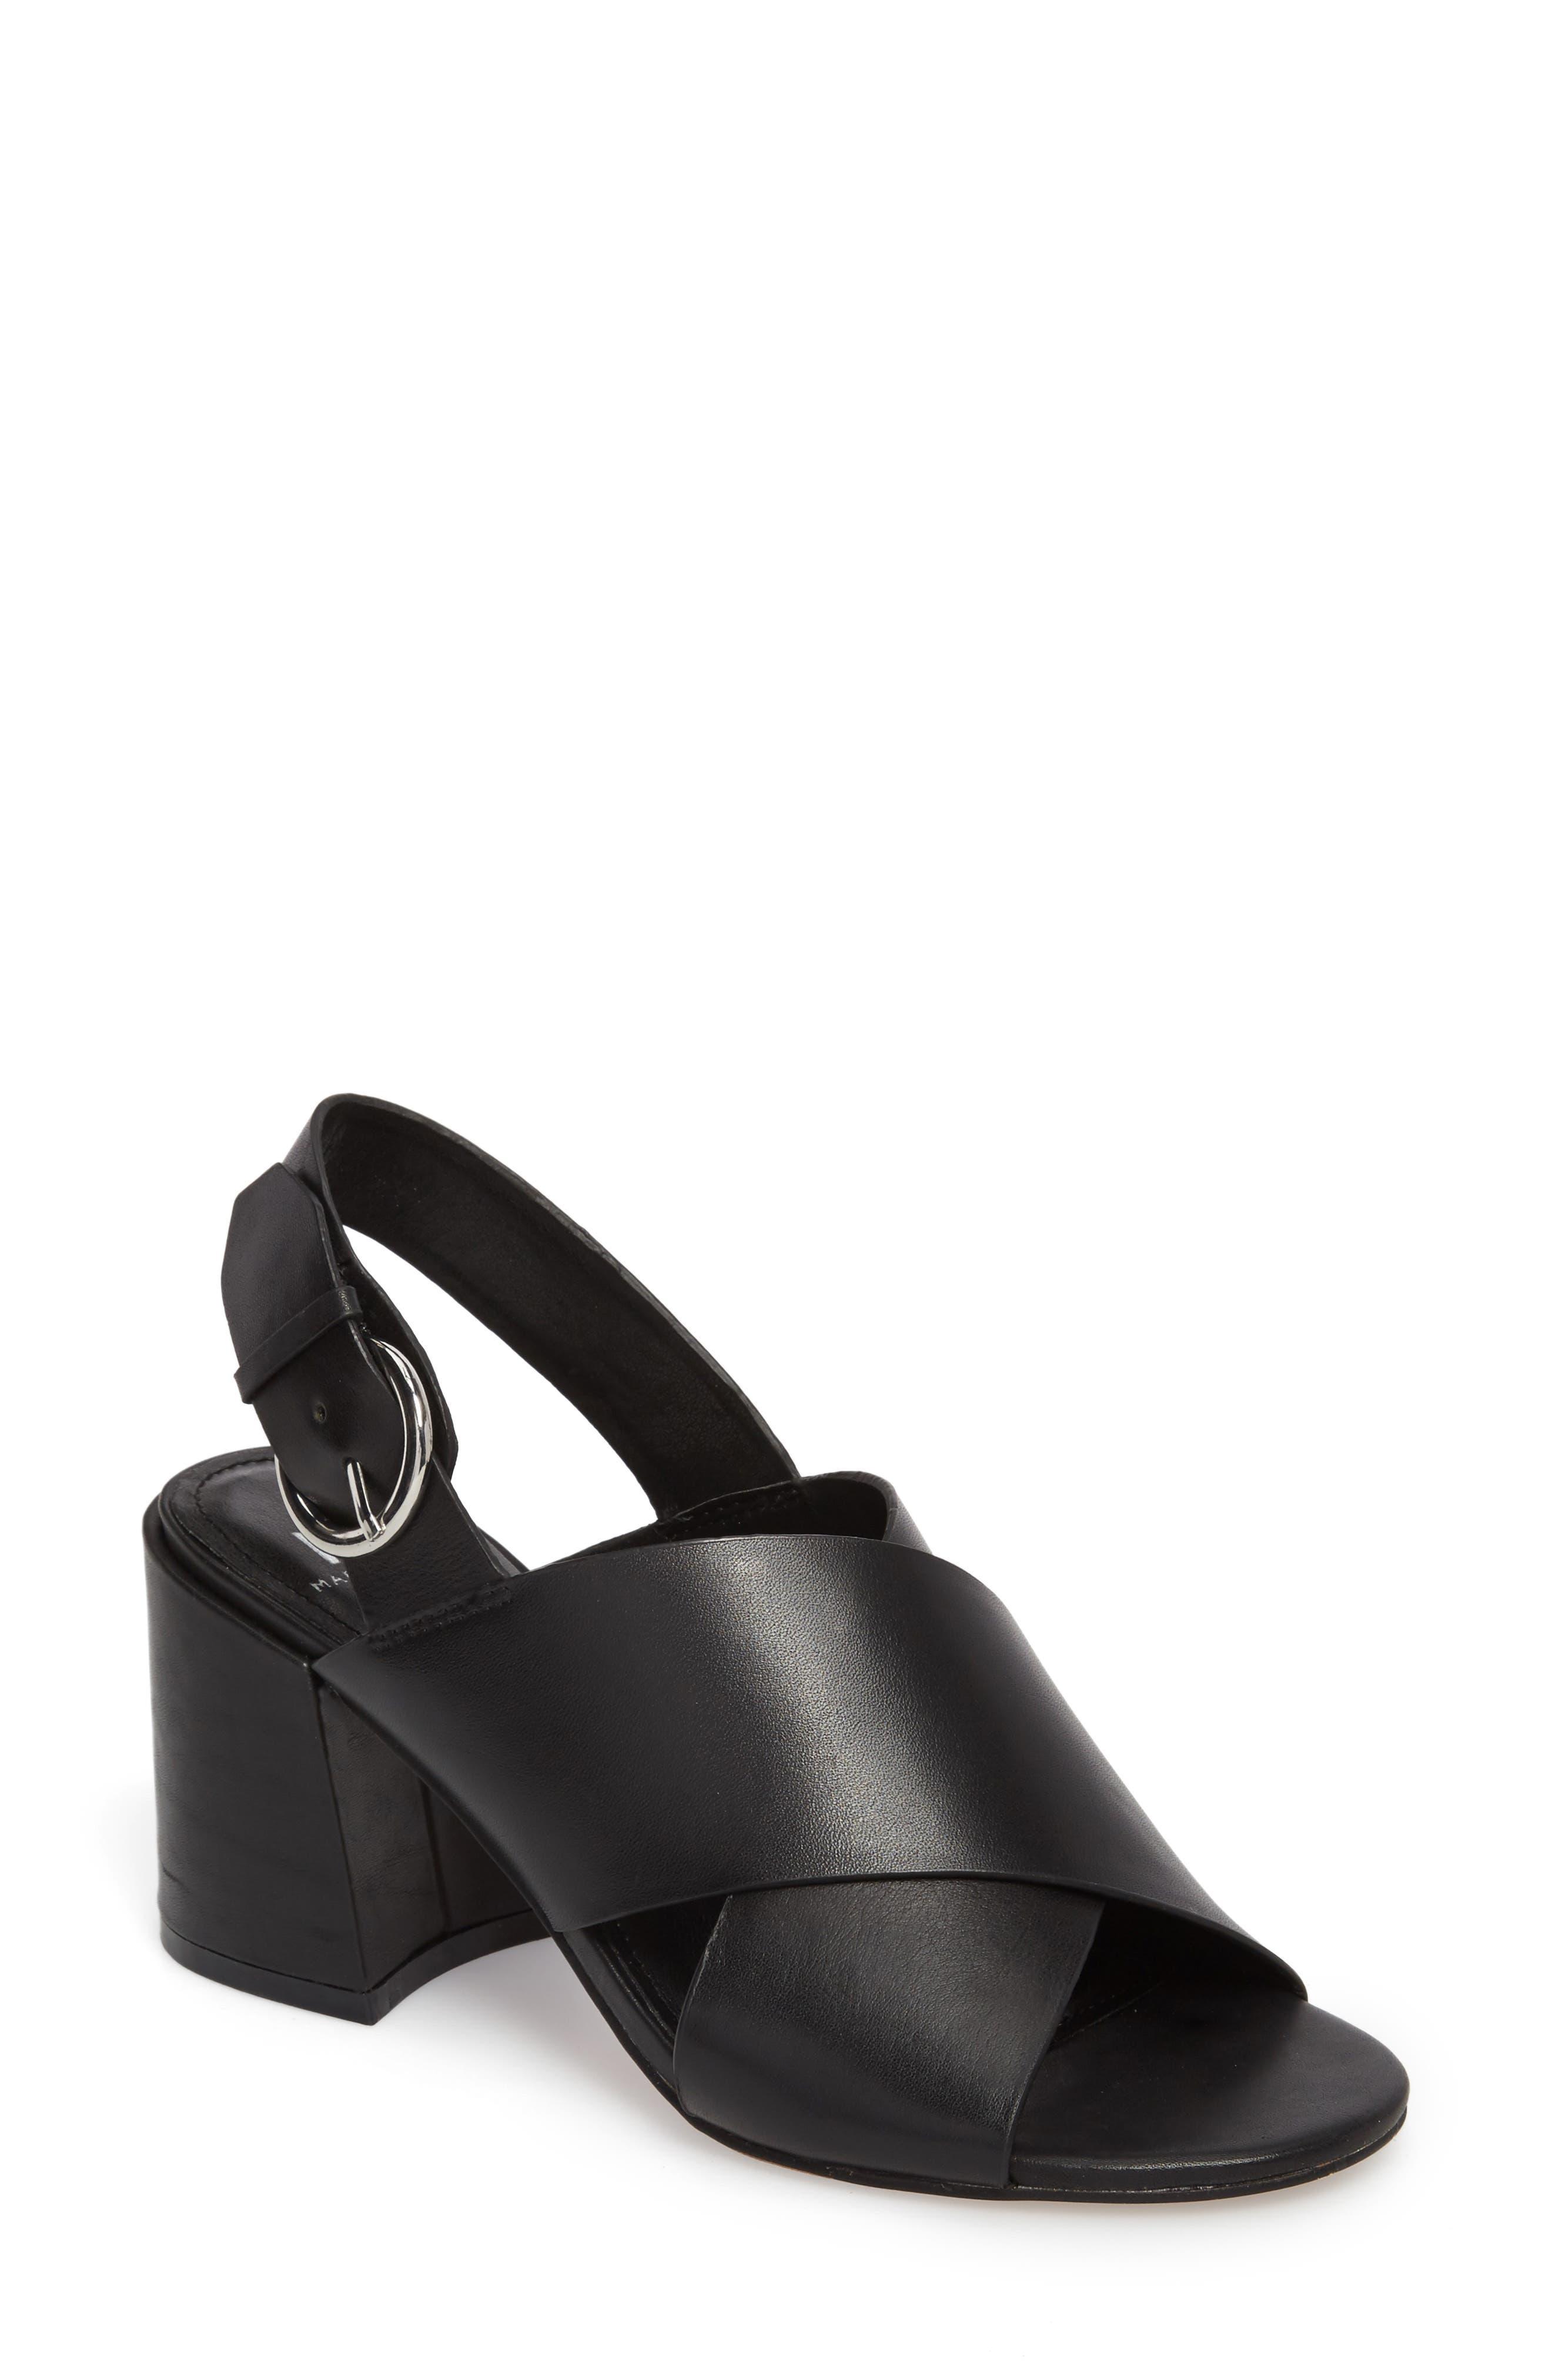 Hocie Slingback Sandal,                         Main,                         color, 001